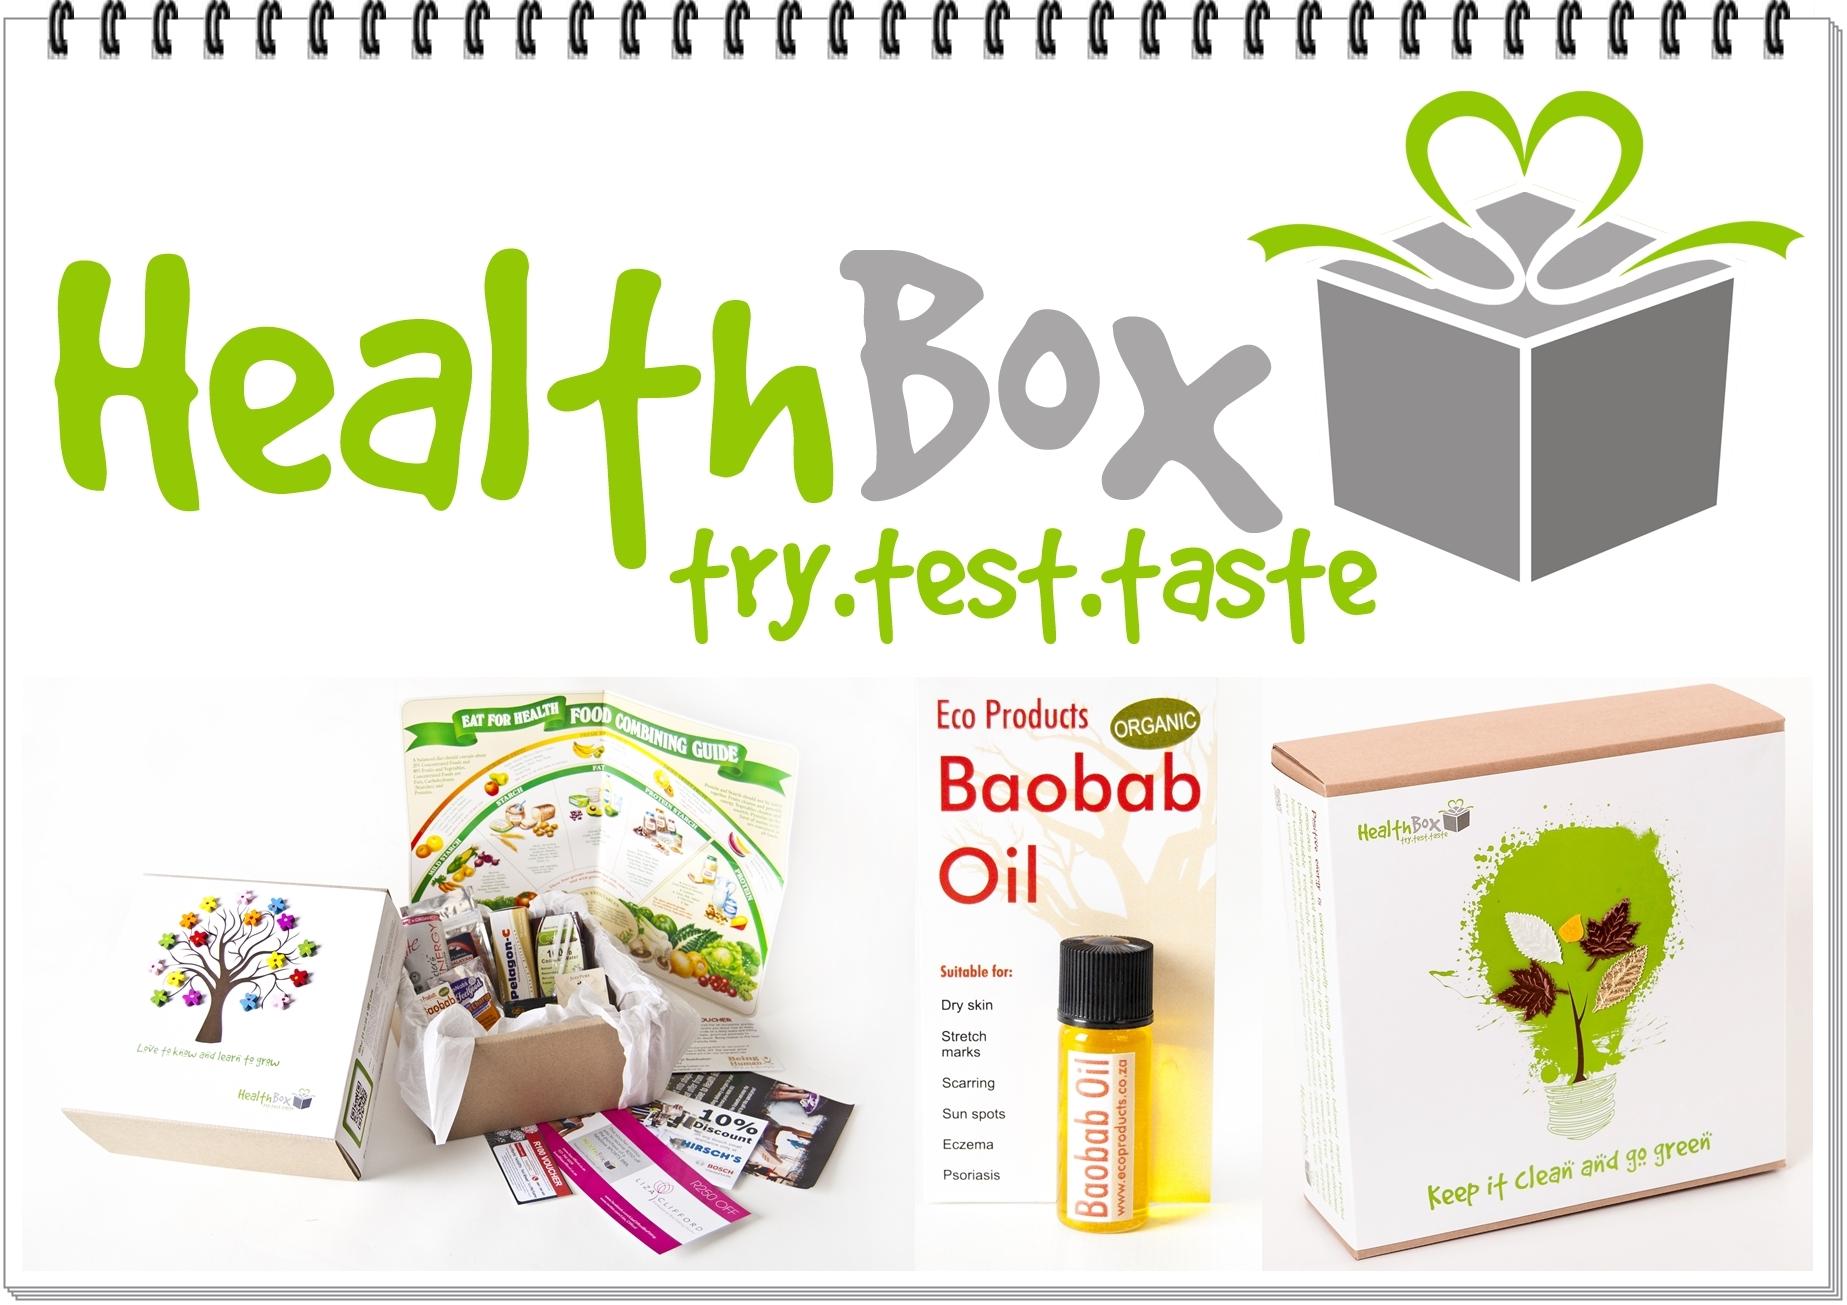 Baobab in Healthbox SA